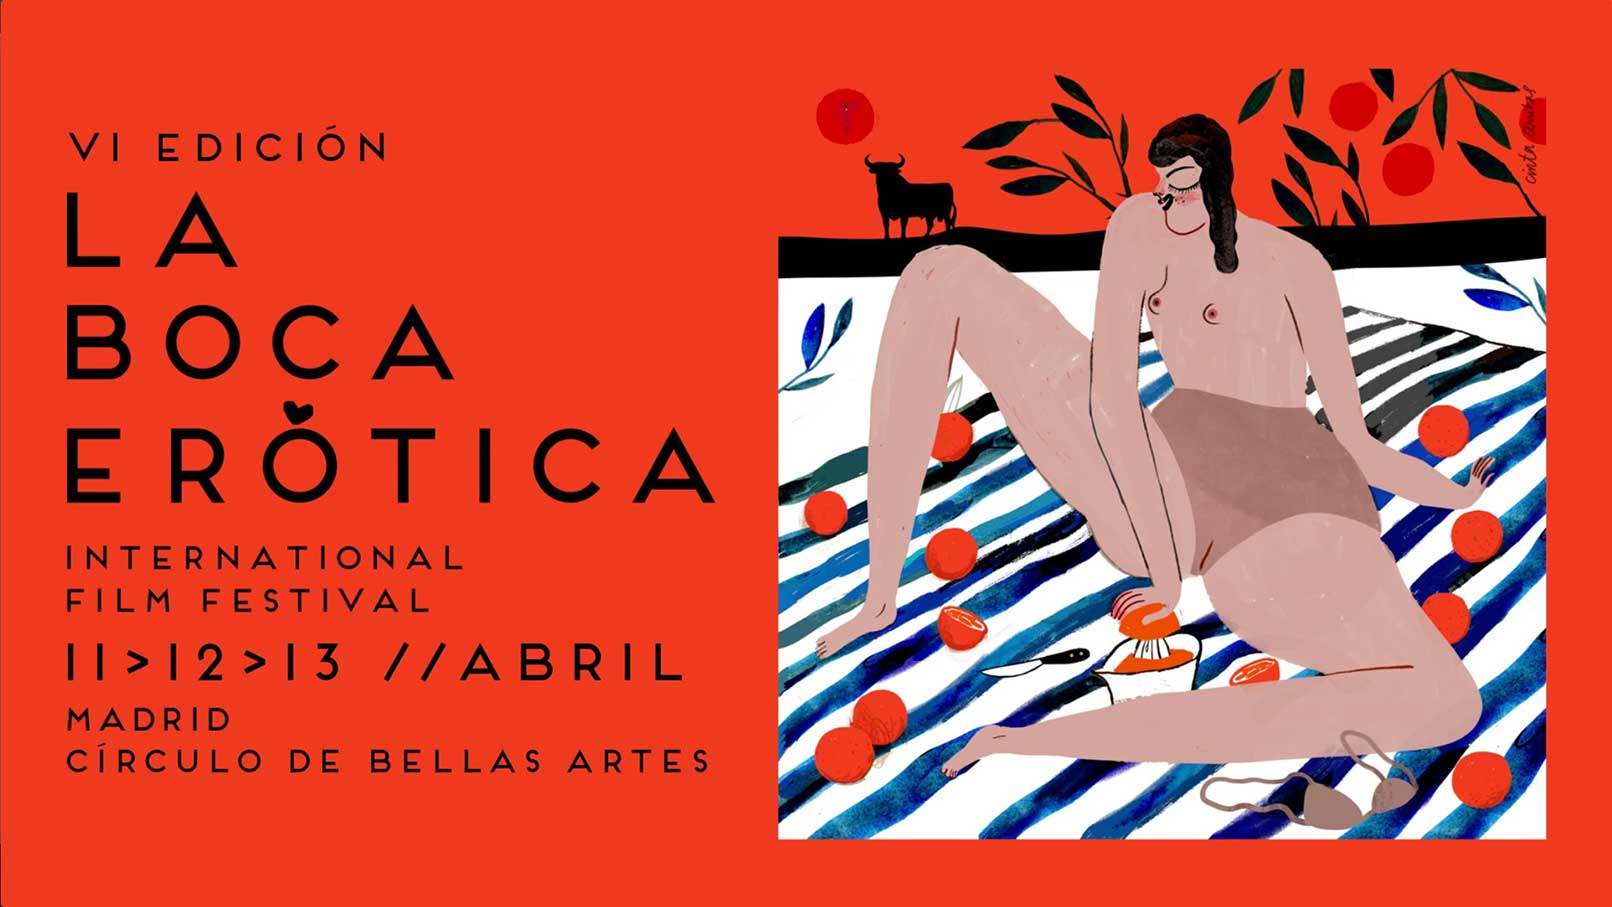 Cinta A_2019_AL BOCA EROTICA_Sexy Spain (00C) con texto 2